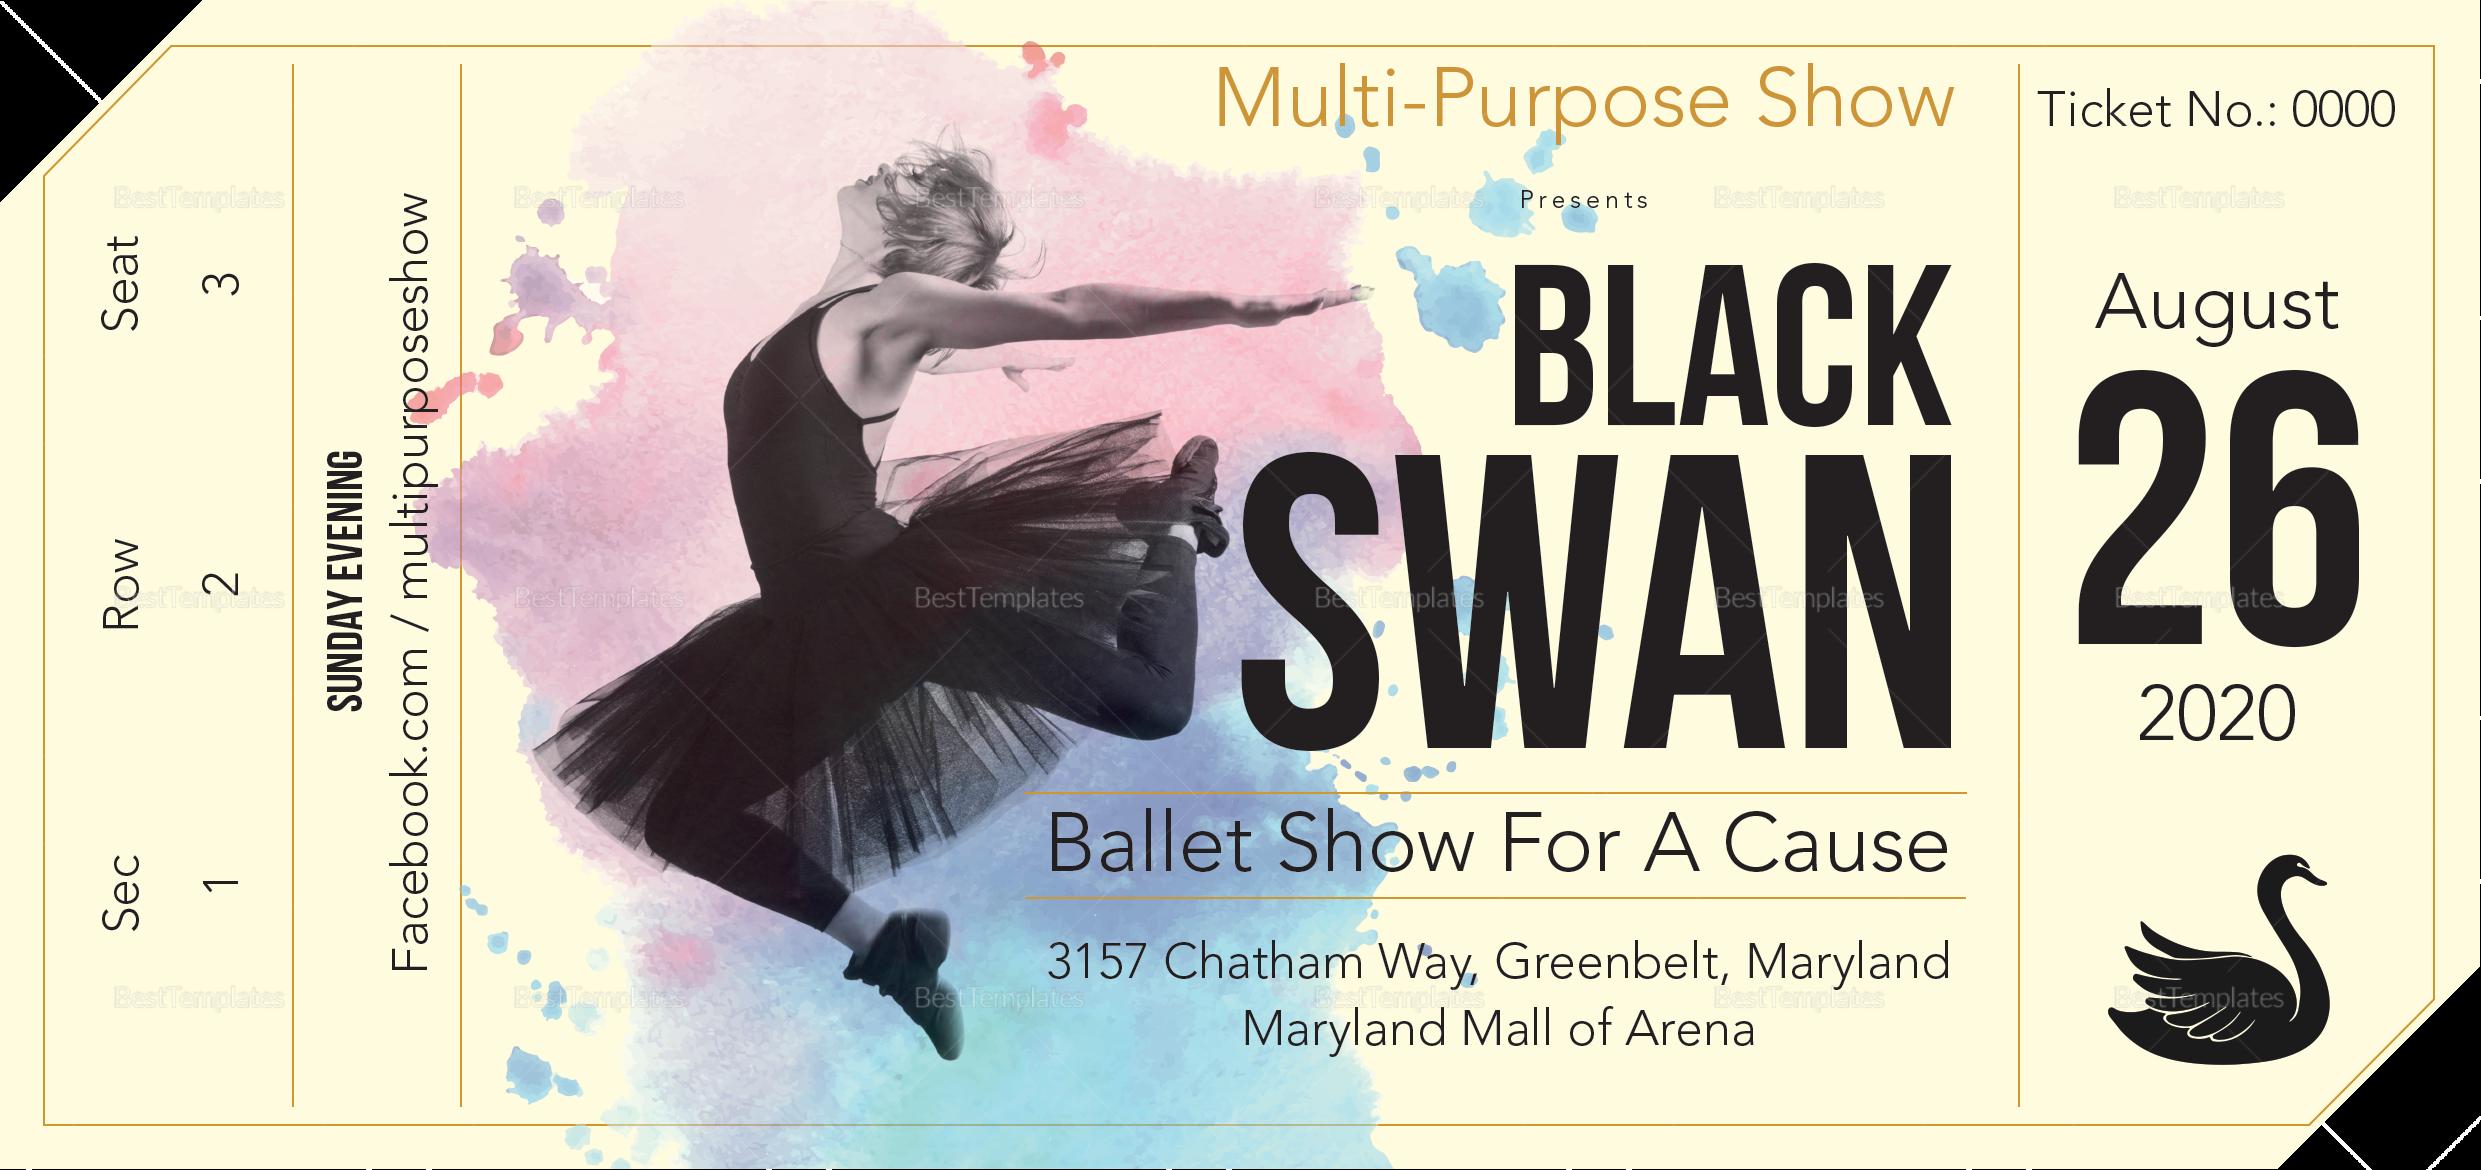 Multi-Purpose Show Ticket to Edit